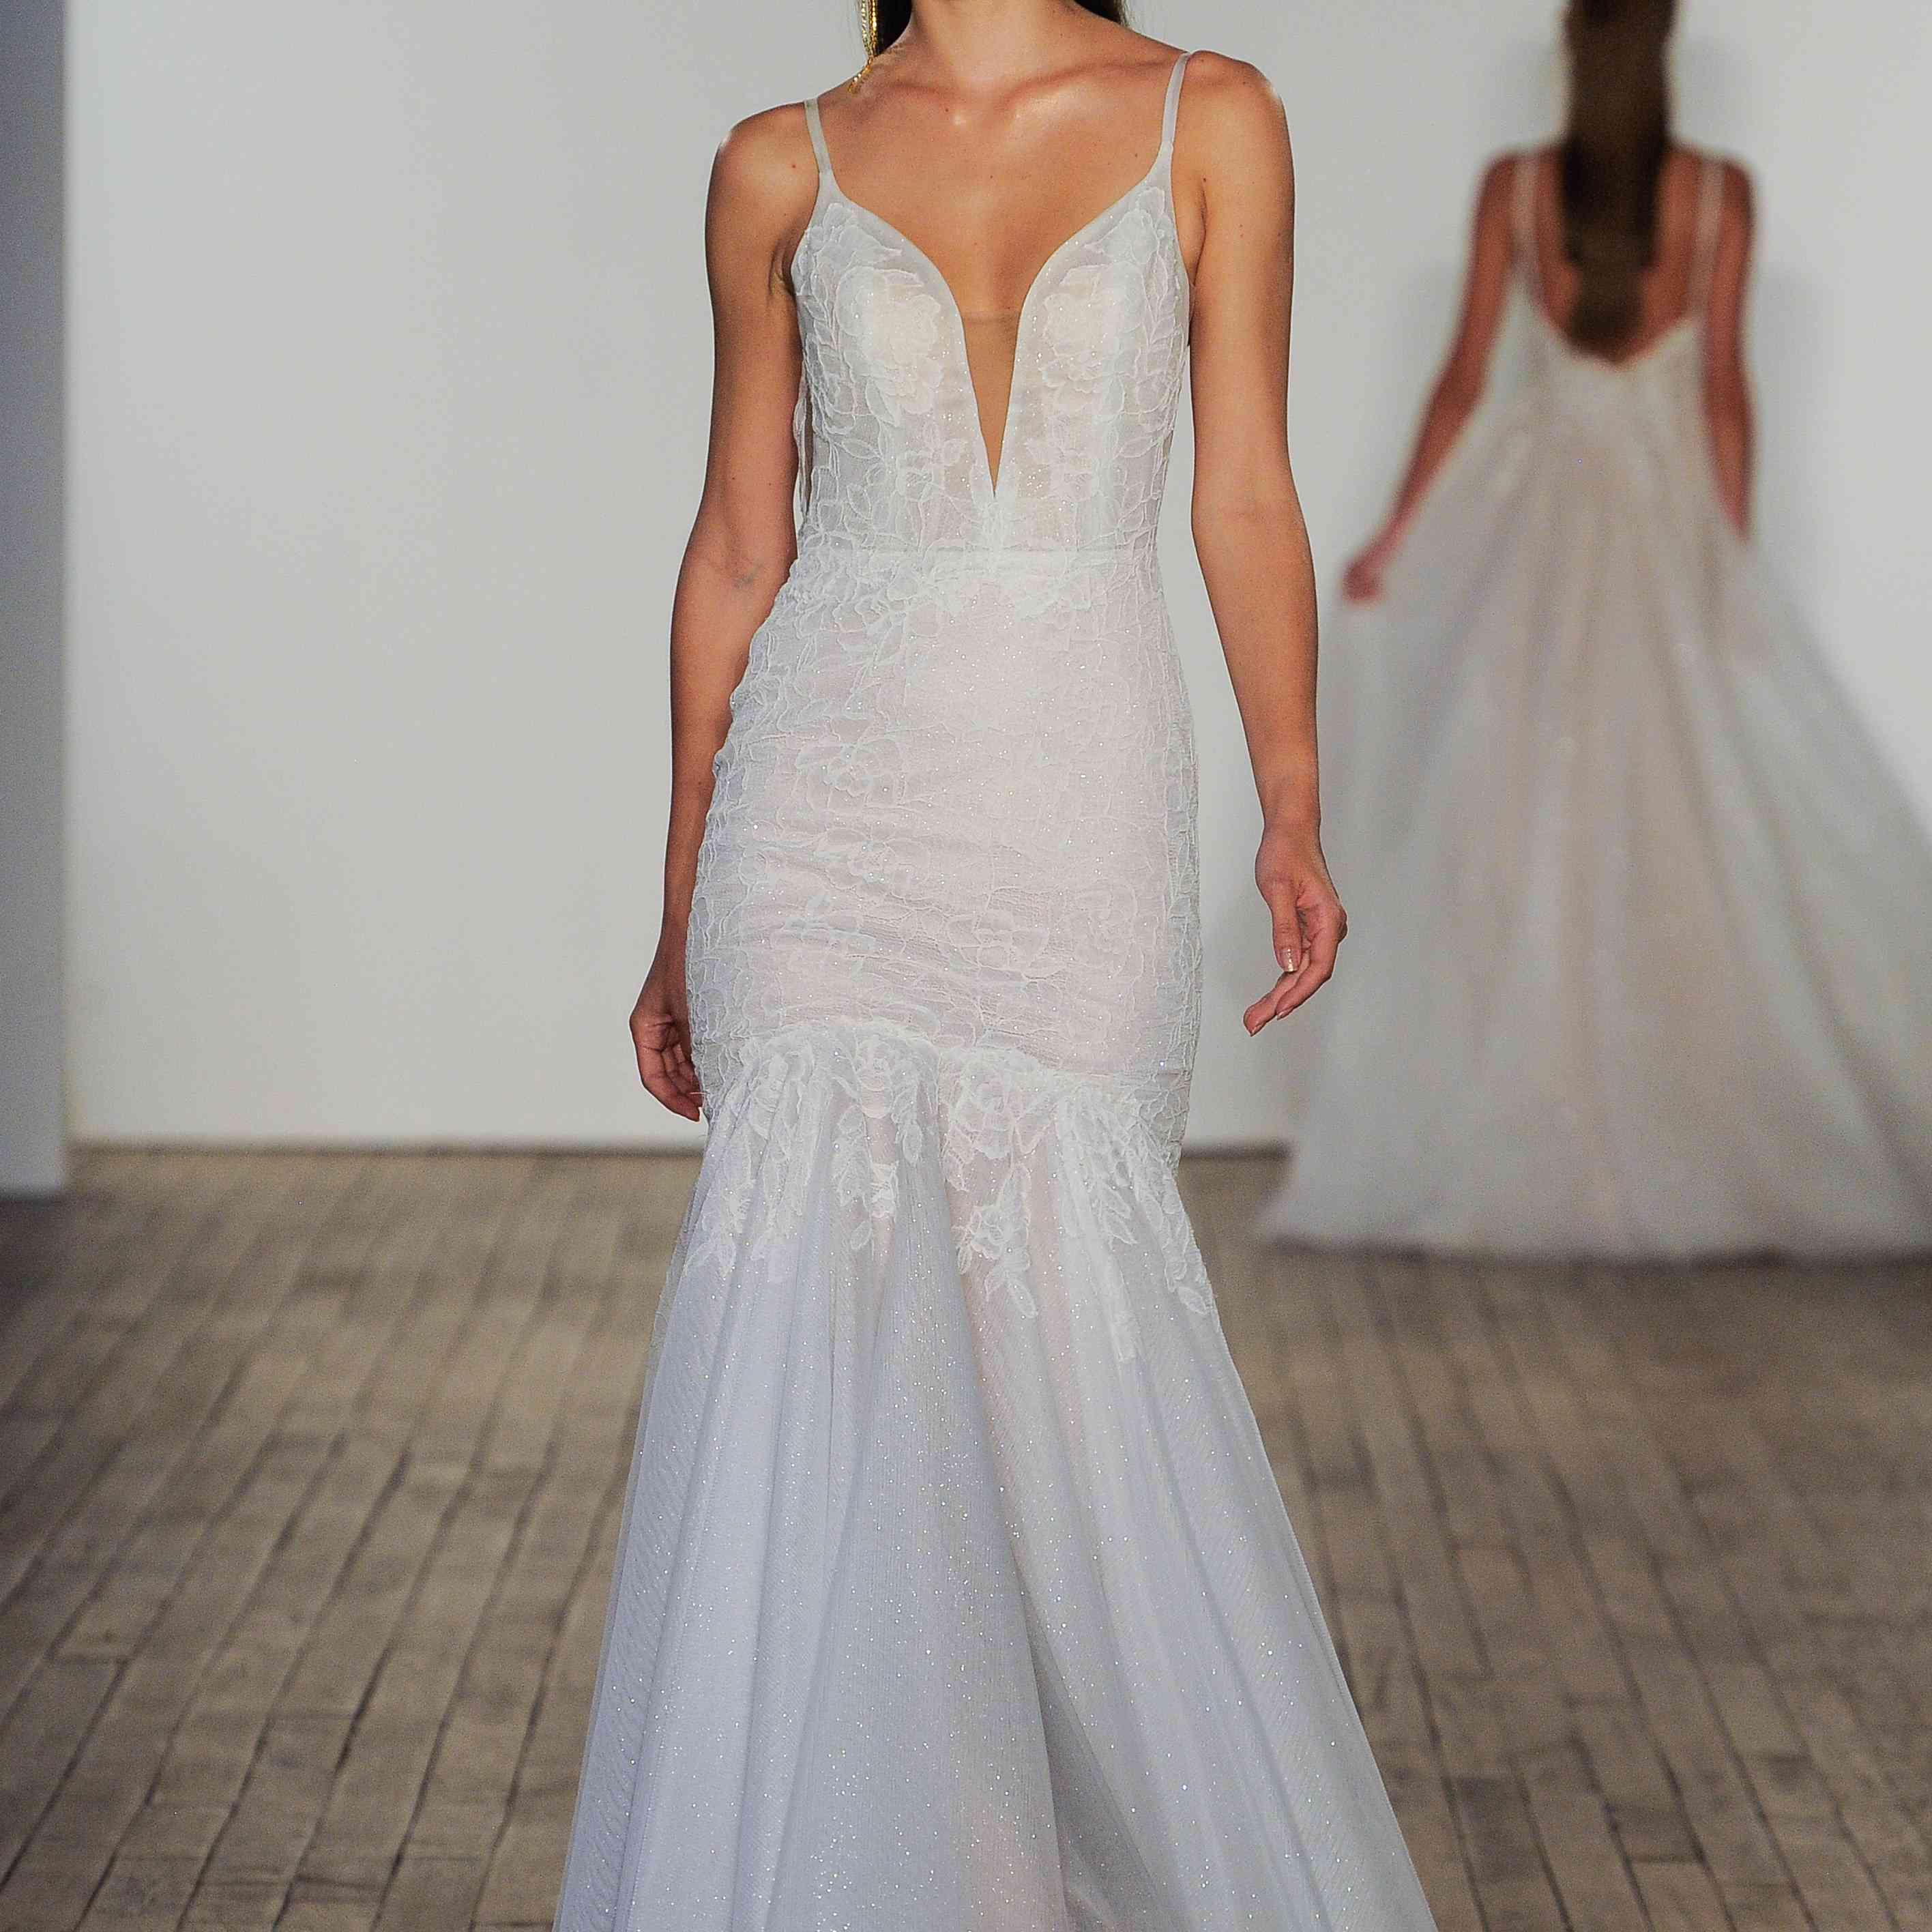 Honey Blush by Hayley Paige Wedding Dress